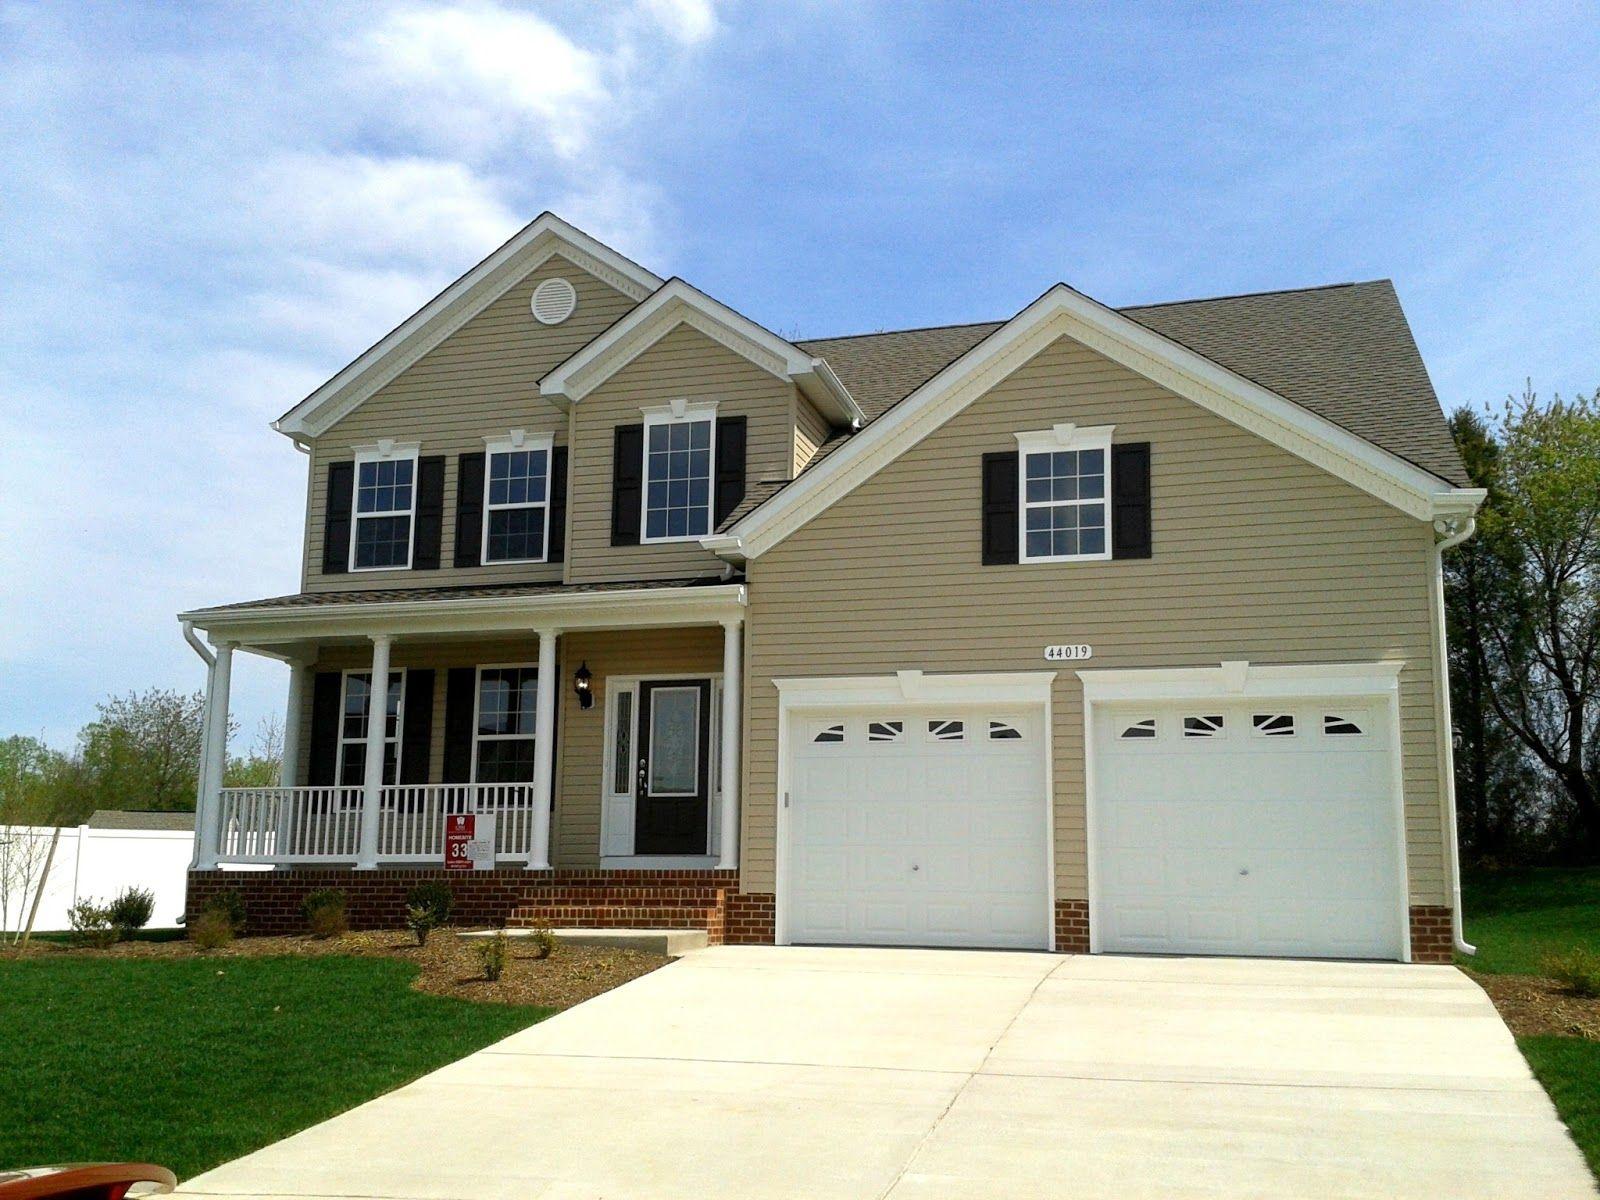 Have A Wonderful Home Exterior Design Using Certainteed Siding Ideas Interesting Home Exterior Desig Exterior House Colors House Paint Exterior House Exterior